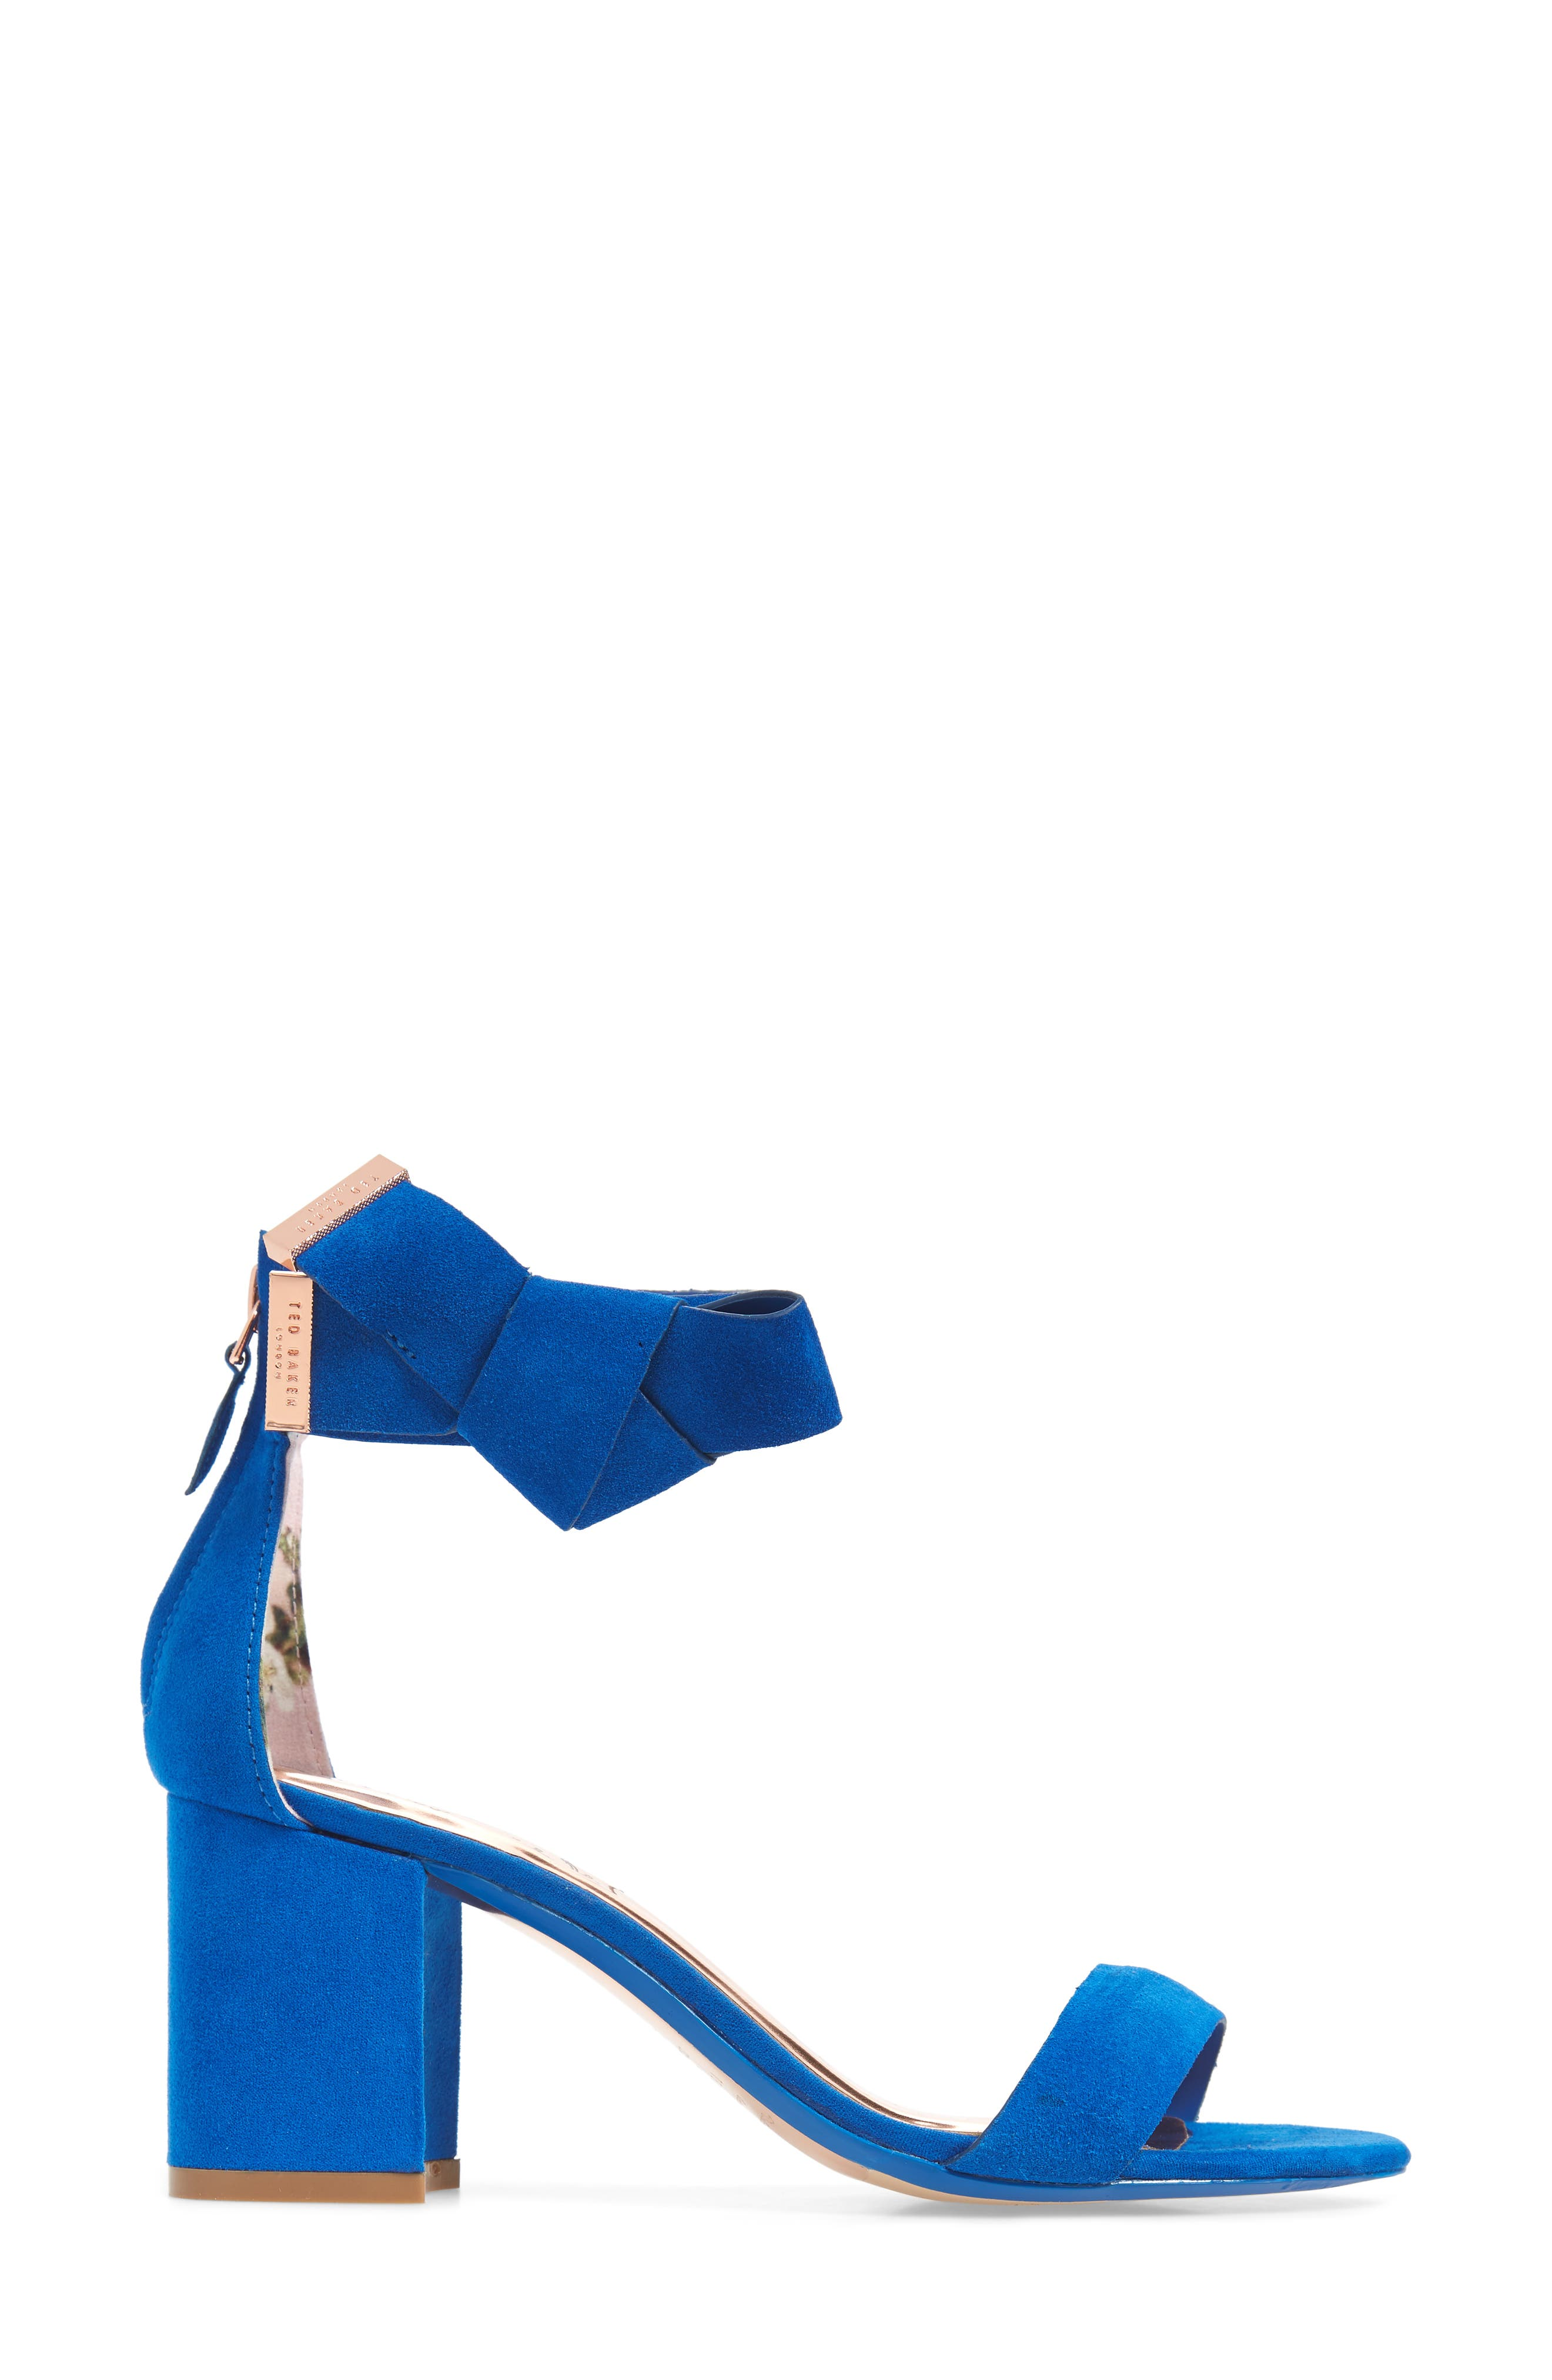 Kerrias Block Heel Sandal,                             Alternate thumbnail 3, color,                             Blue Suede